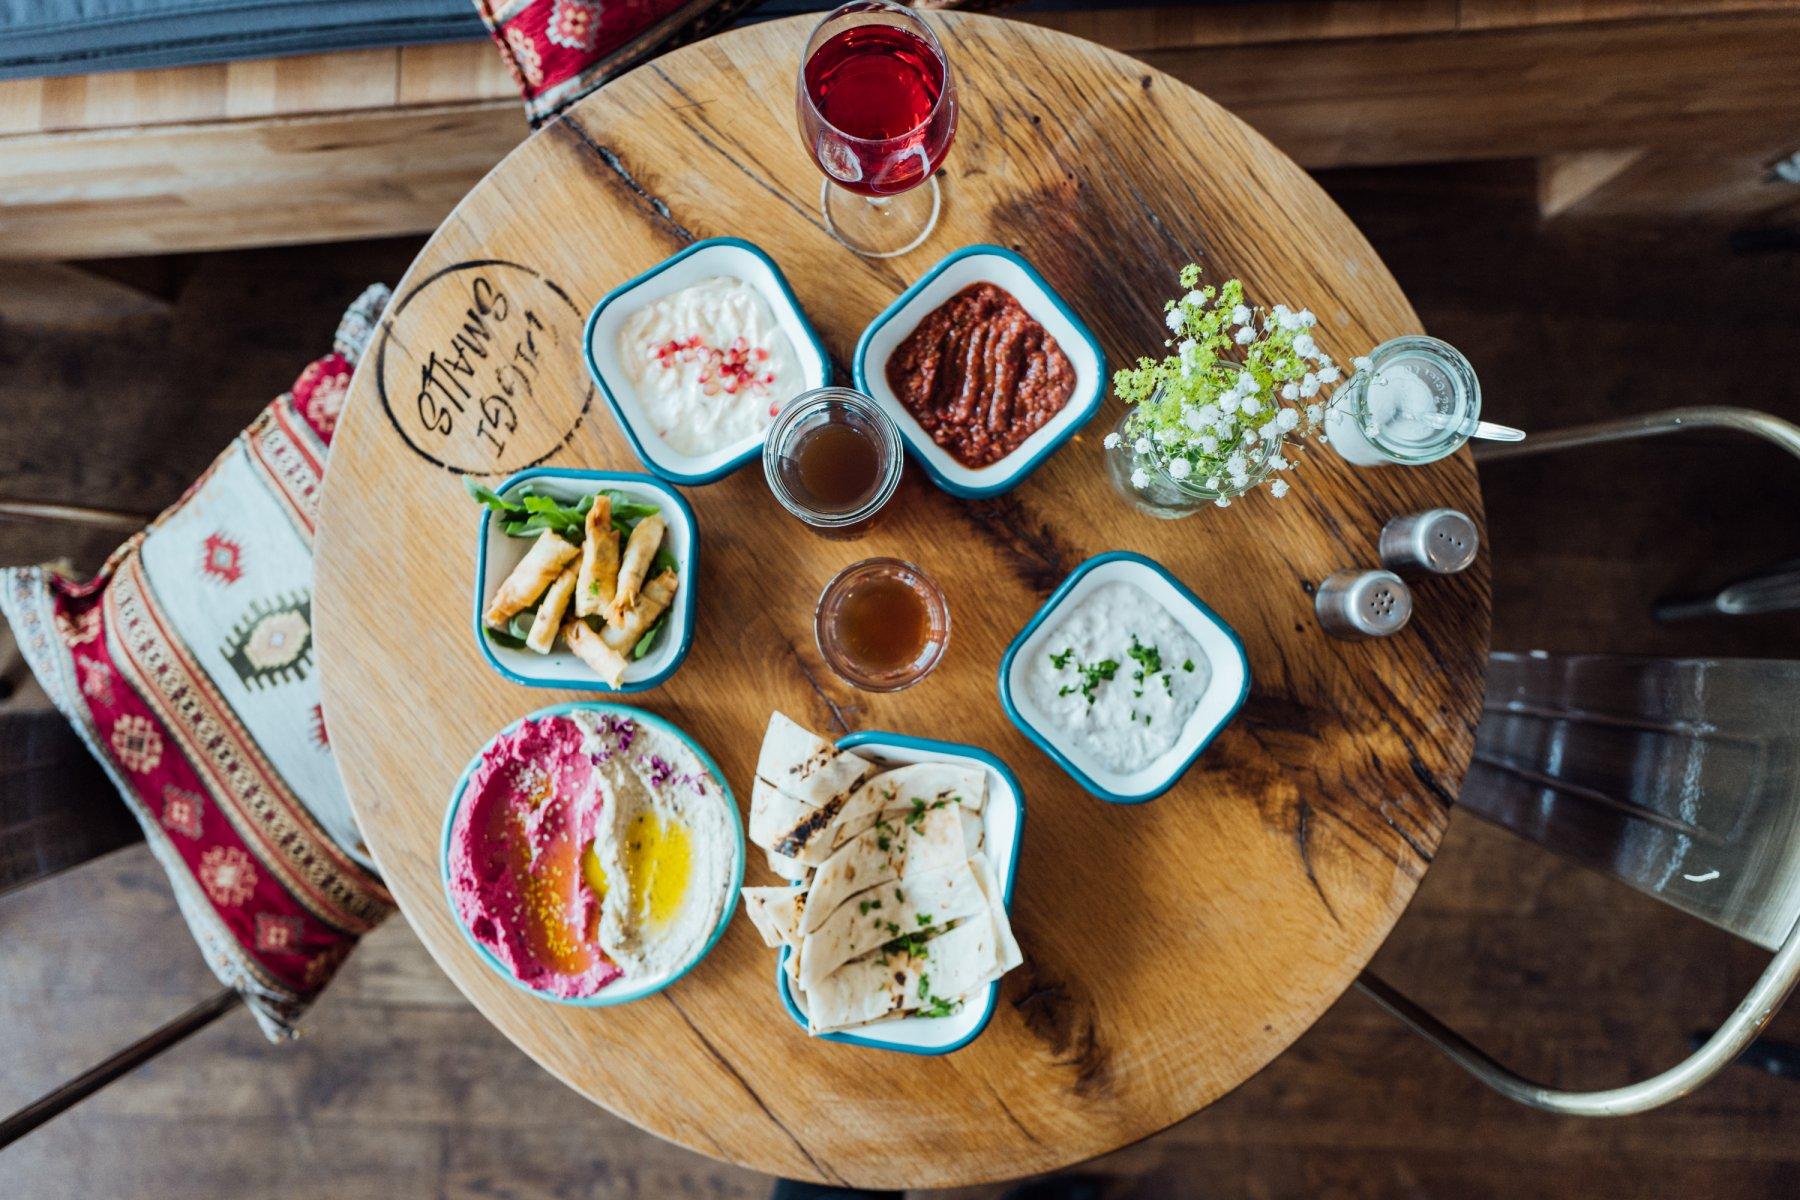 Geheimtipp Hamburg Essen & Trinken Restaurant Grindel Diggi Smalls Lisa Knauer 4